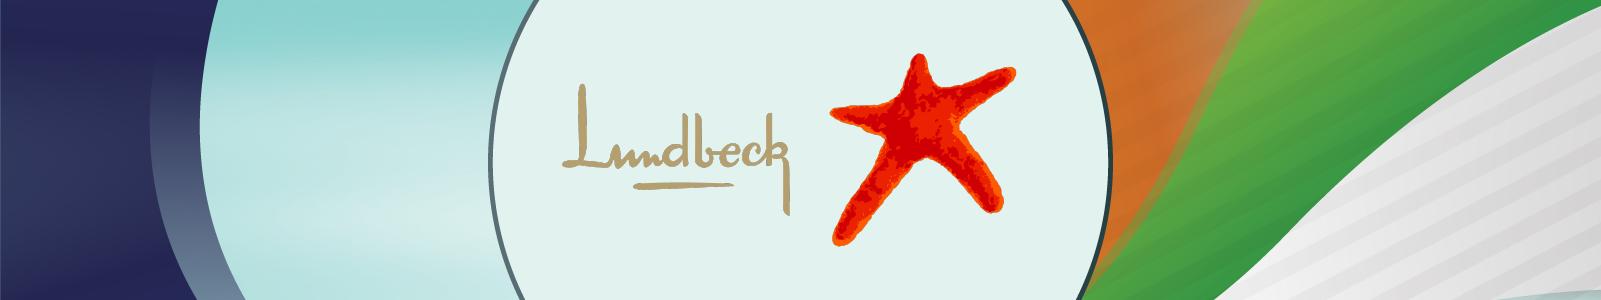 ETED2021-banner-lundbeck